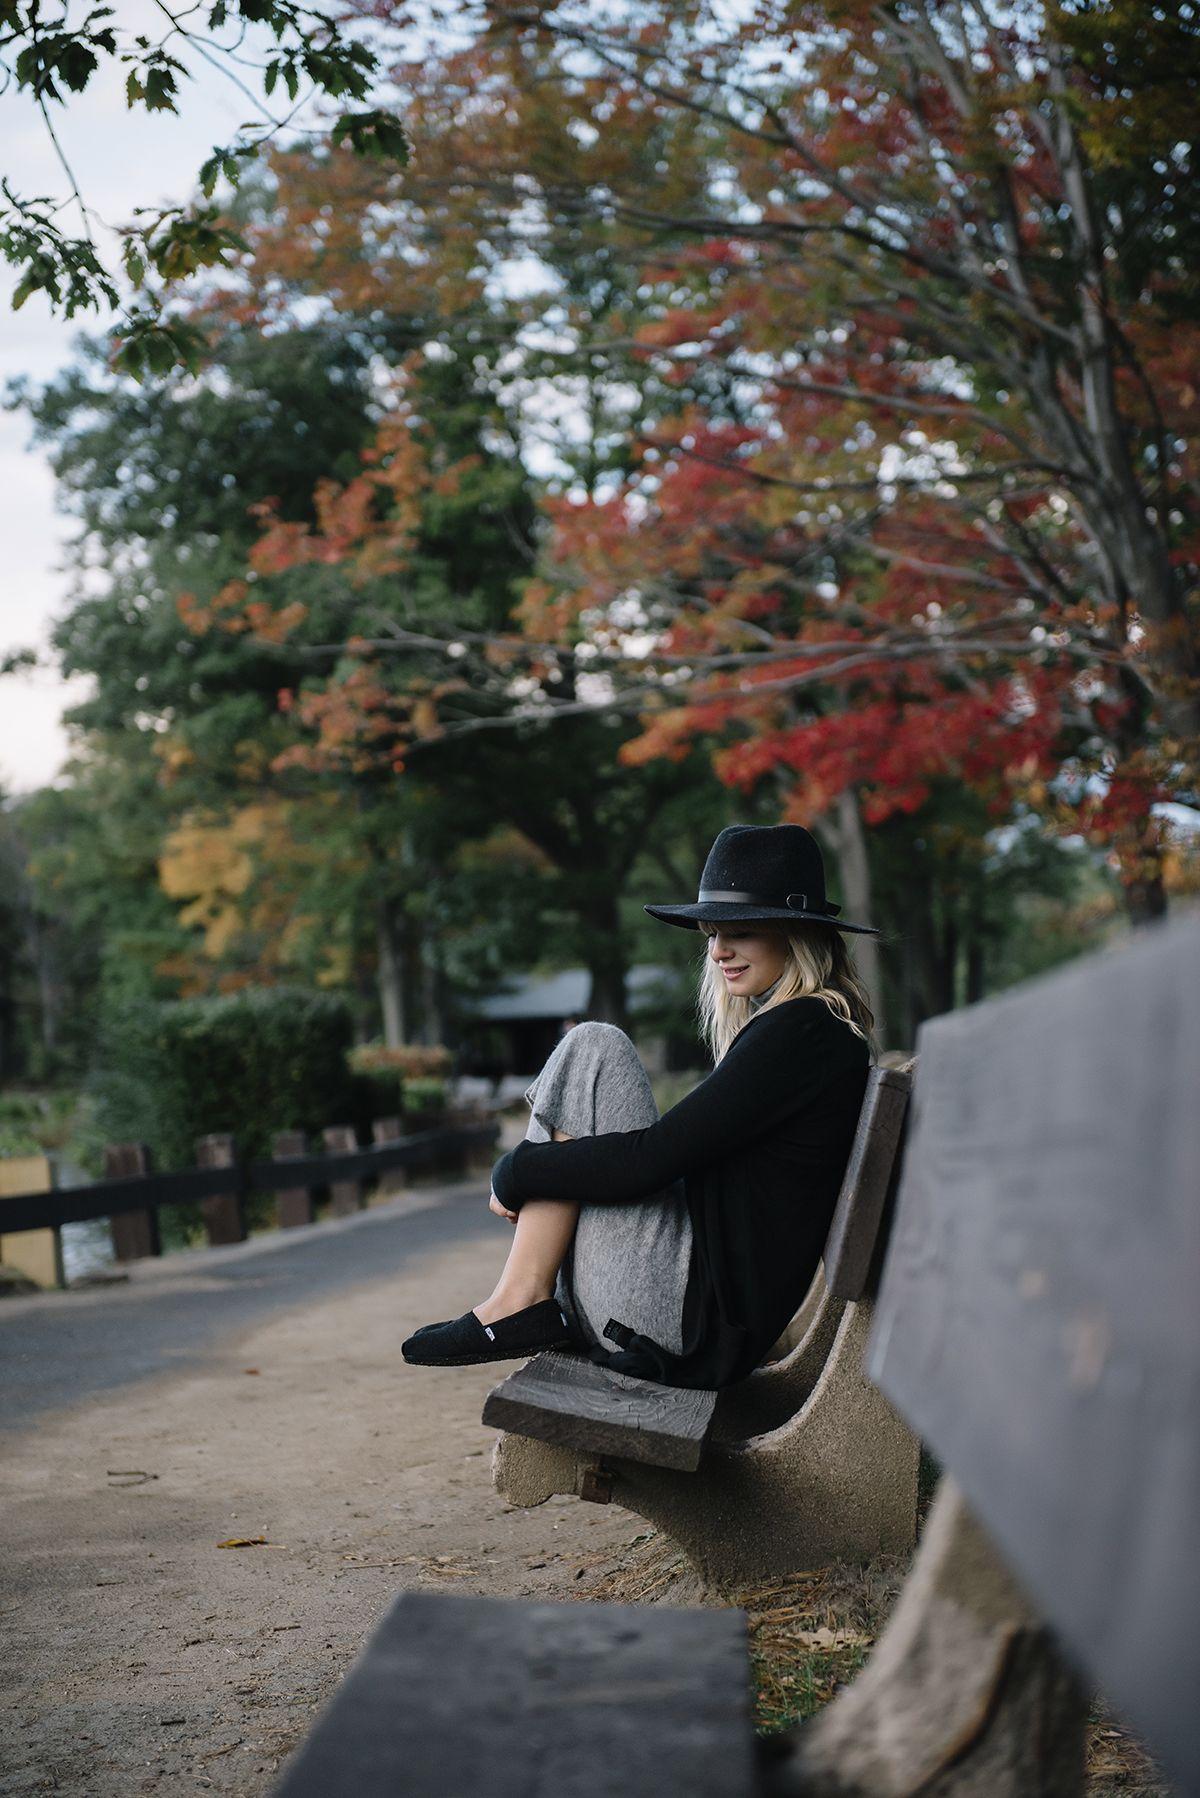 Digital Influencer Lisa Dengler in a Michael Stars Oh My Darling Wide Brim Hat